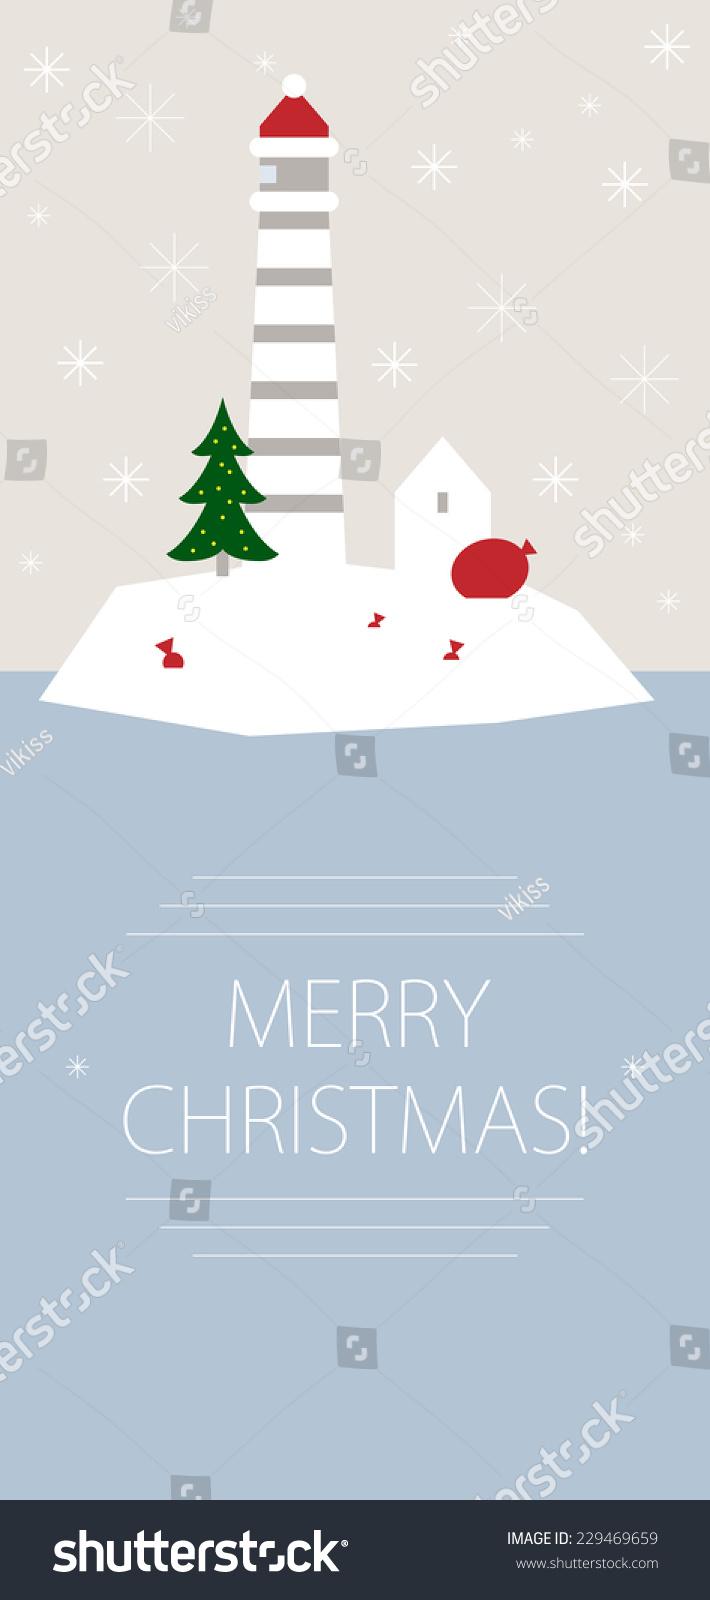 Christmas Card Greetings Island Lighthouse Stock Illustration